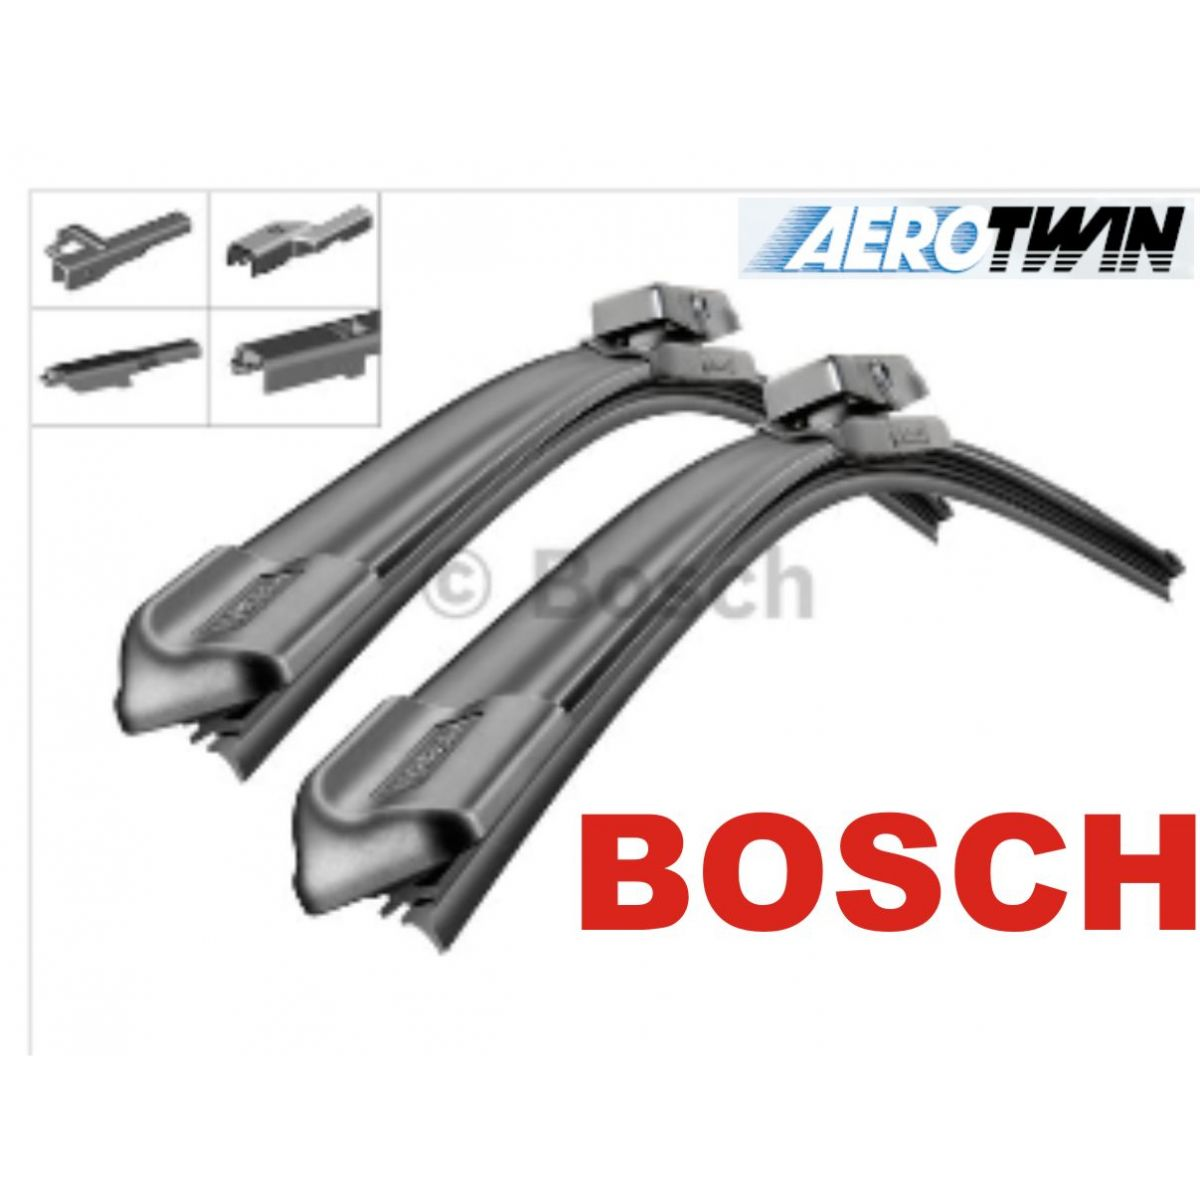 Palheta Bosch Aerotwin Plus Limpador de para brisa Bosch Audi TT / TT  Roadster ano 2003 até 2006